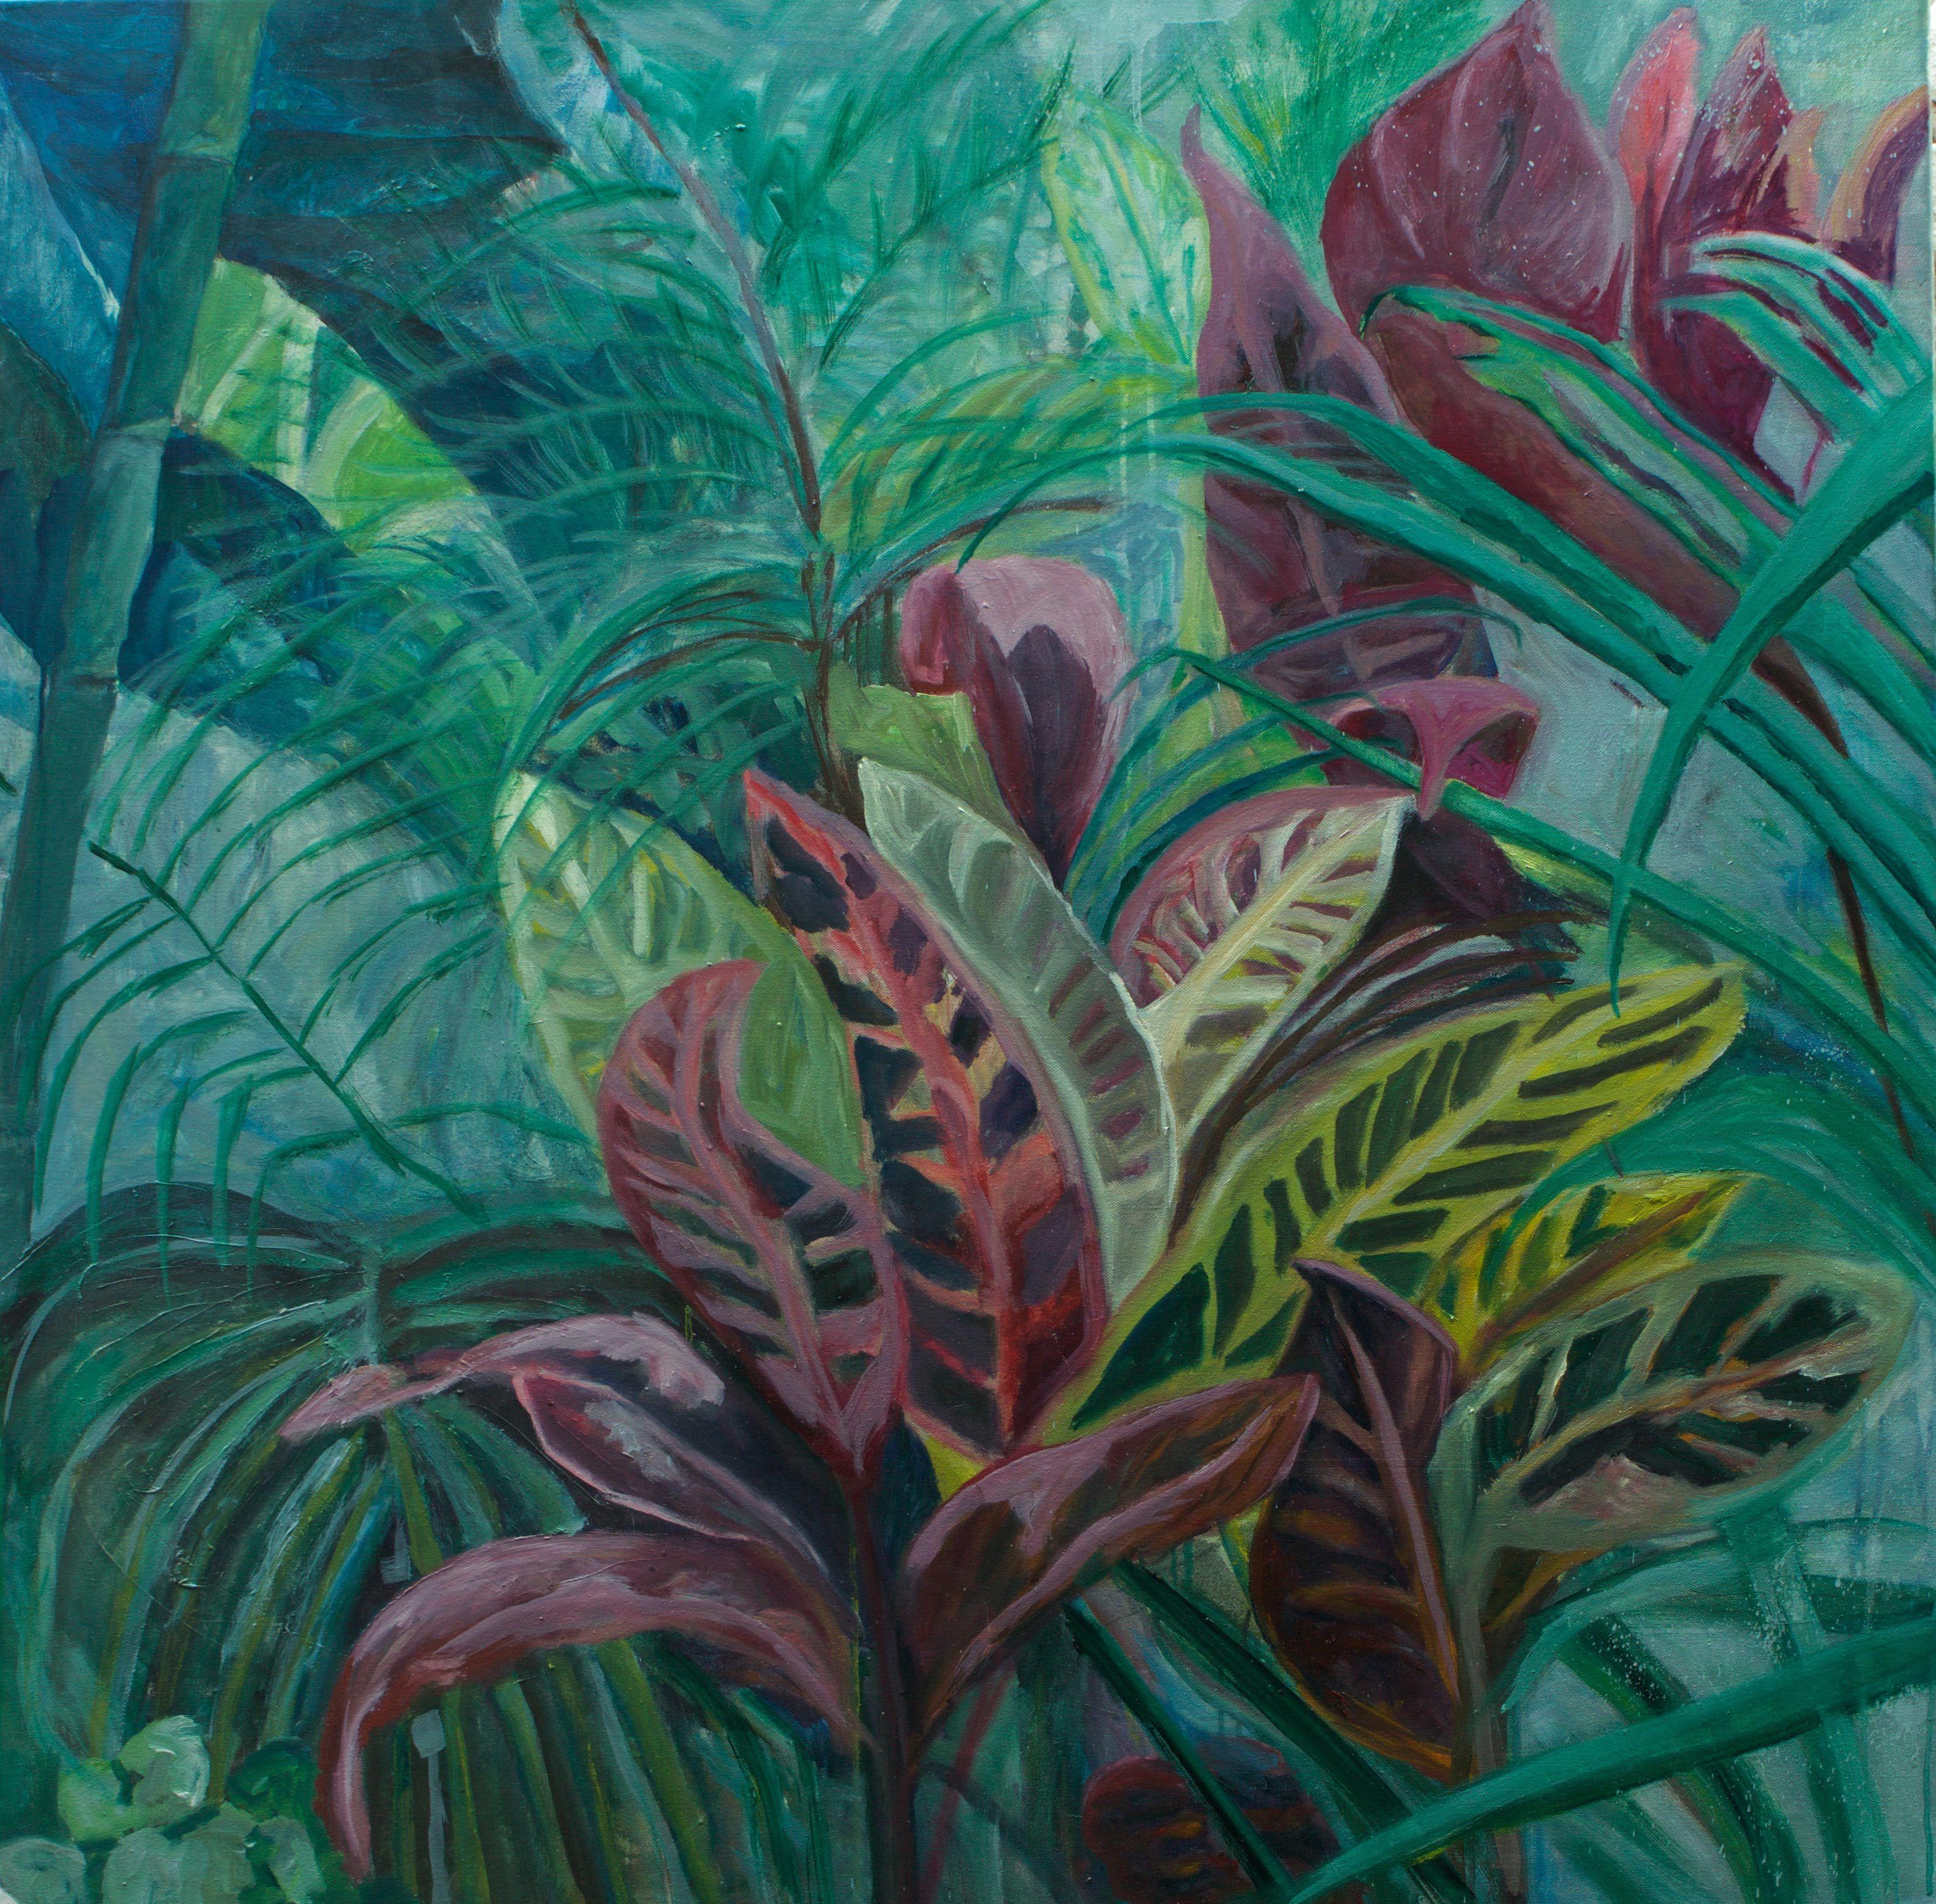 Hemingway's Garden II, 100 x100cm, 2016, Oil on Canvas, available by artist: charlotte@vonelm.net, 2.000 Euro